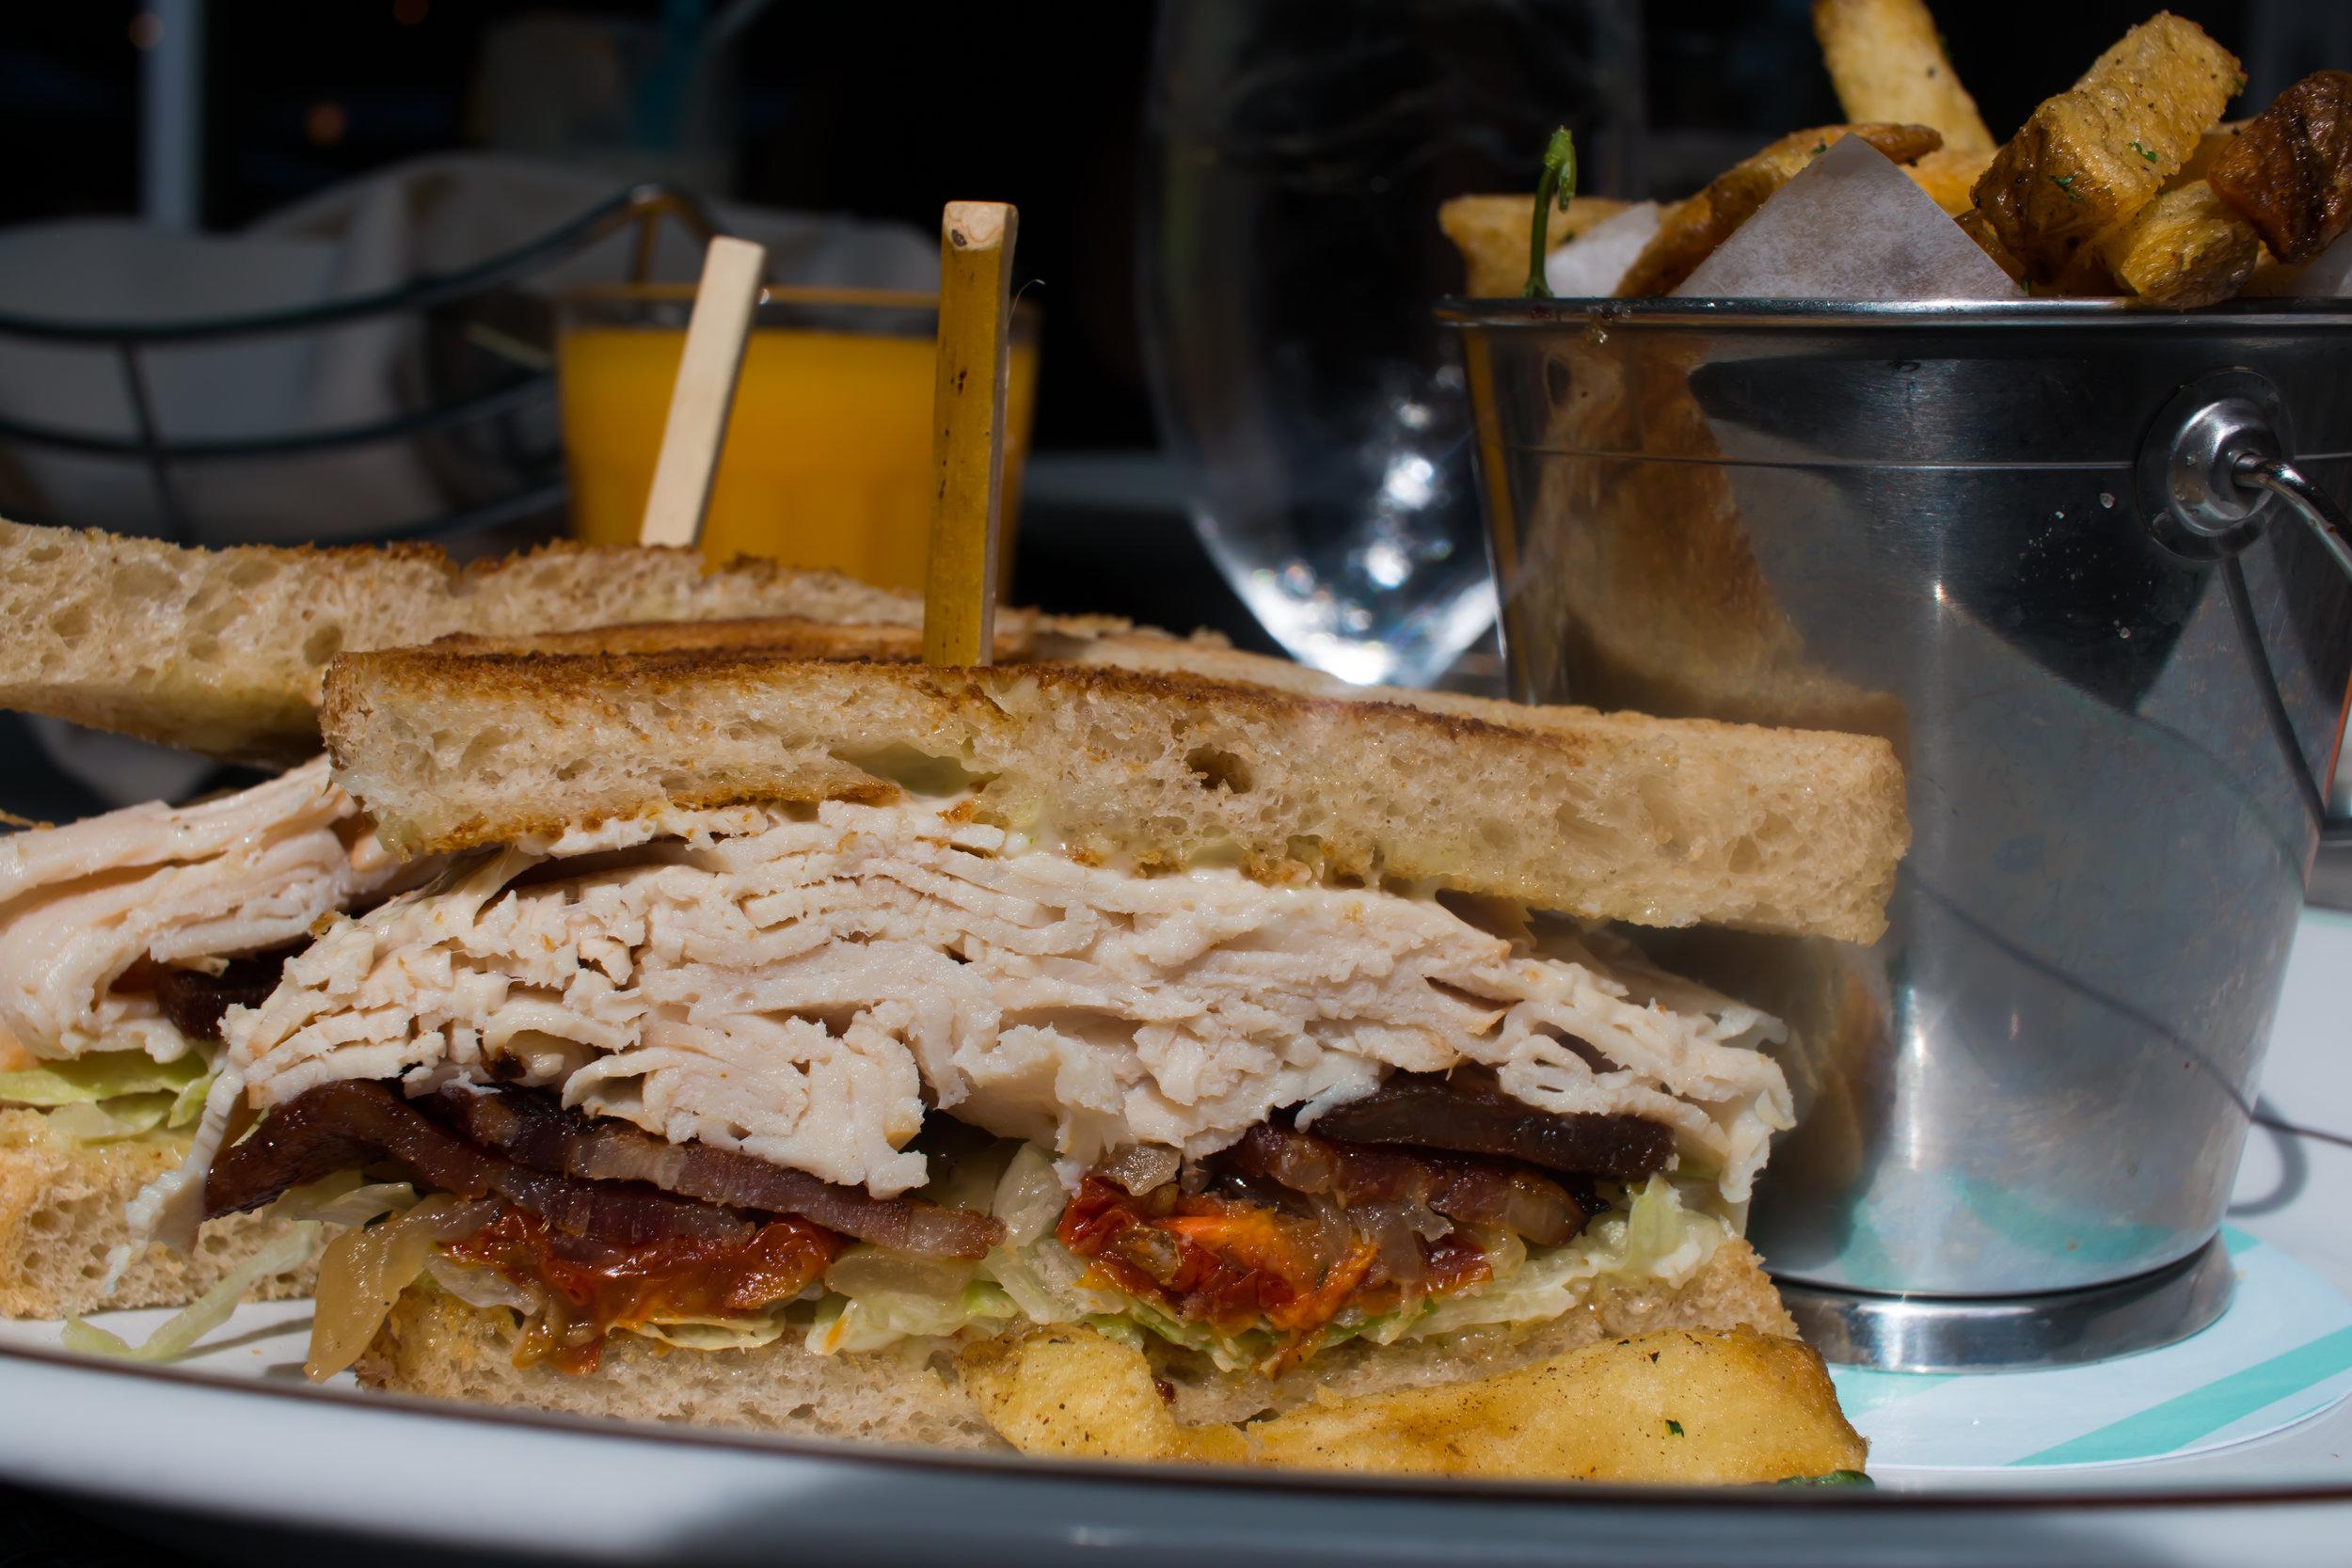 zuzu-brunch-sandwich-hotel-valley-ho-scottsdale-arizona